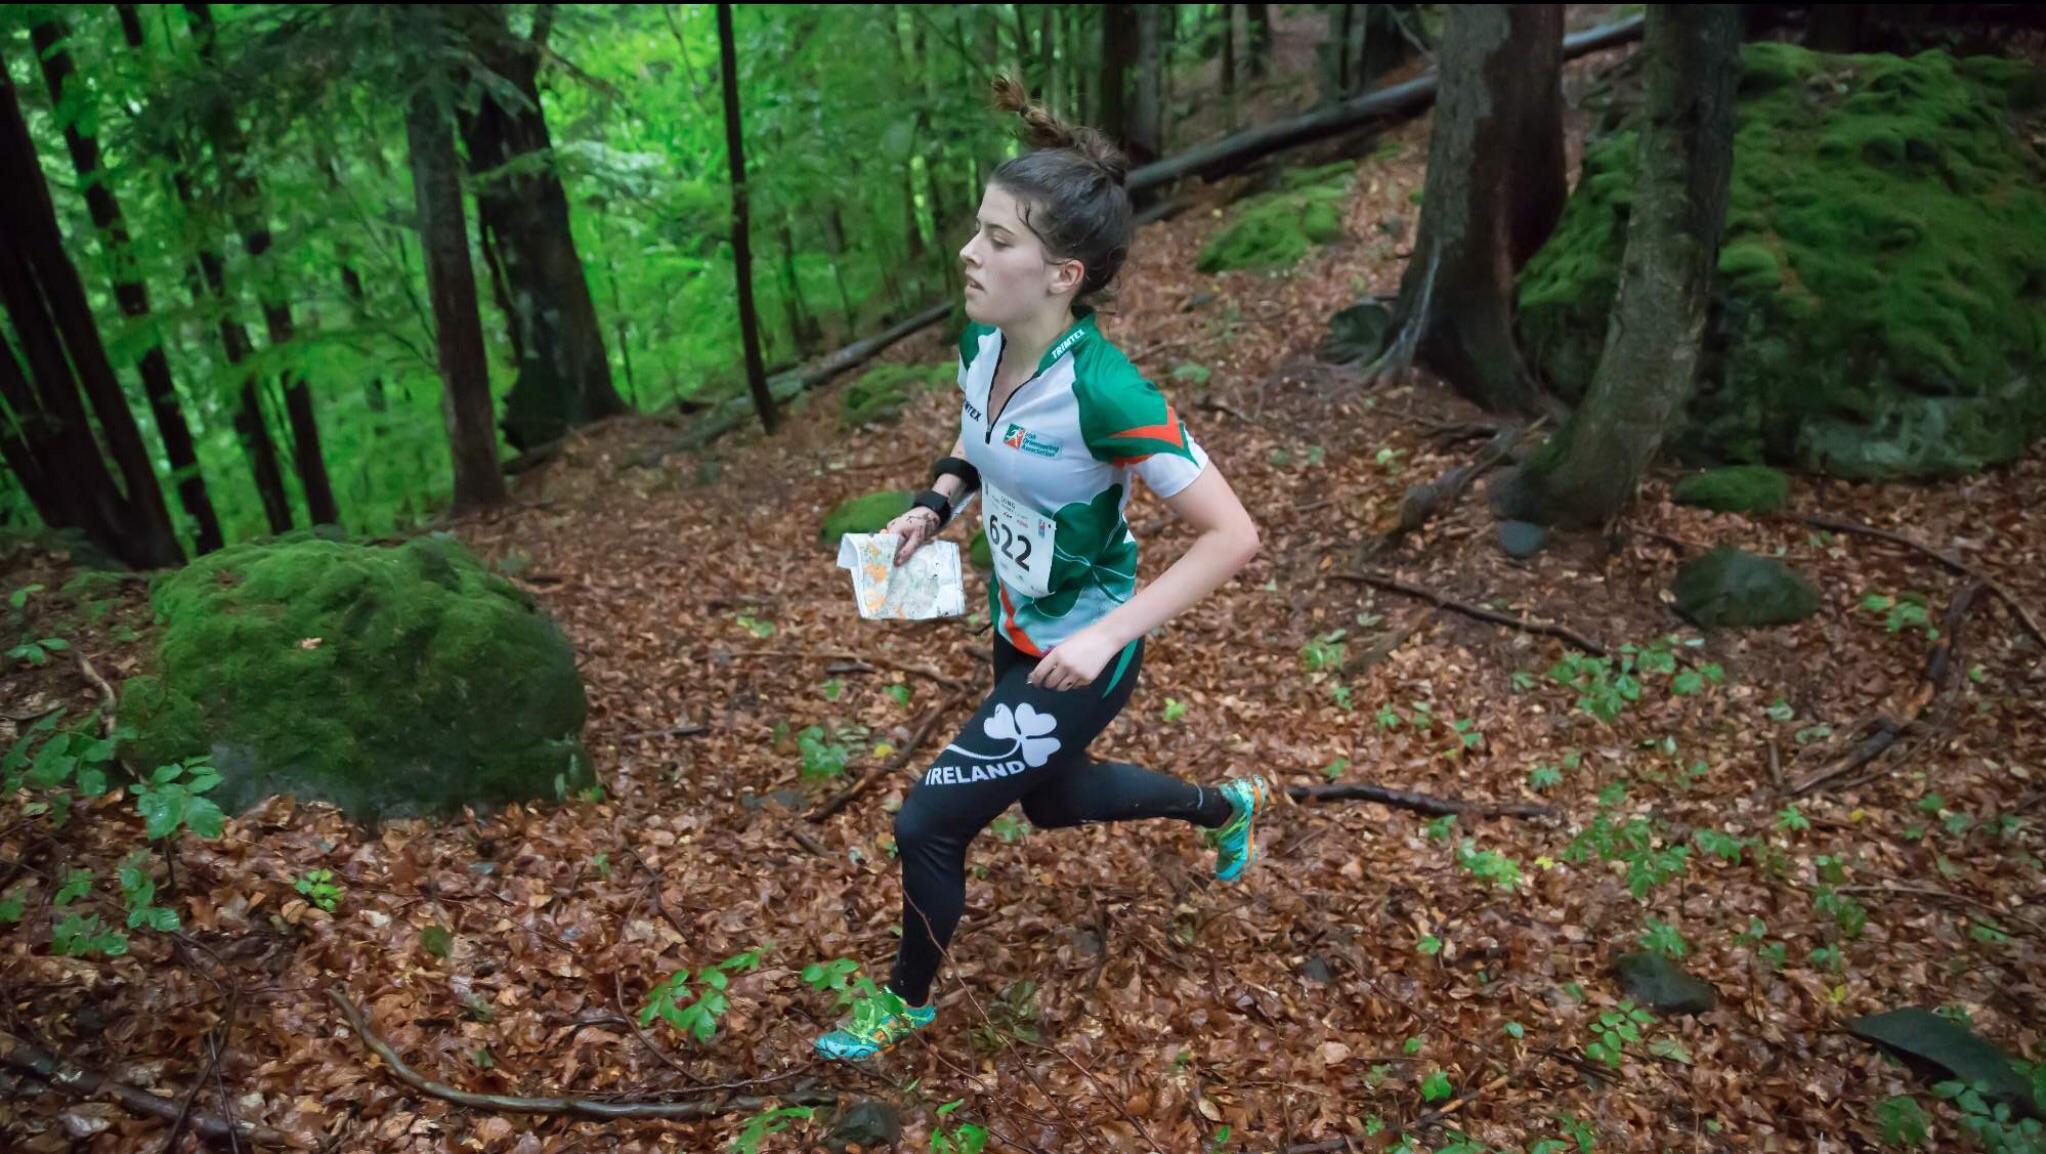 Eadaoin McC. running in EYOC in Slovakia.